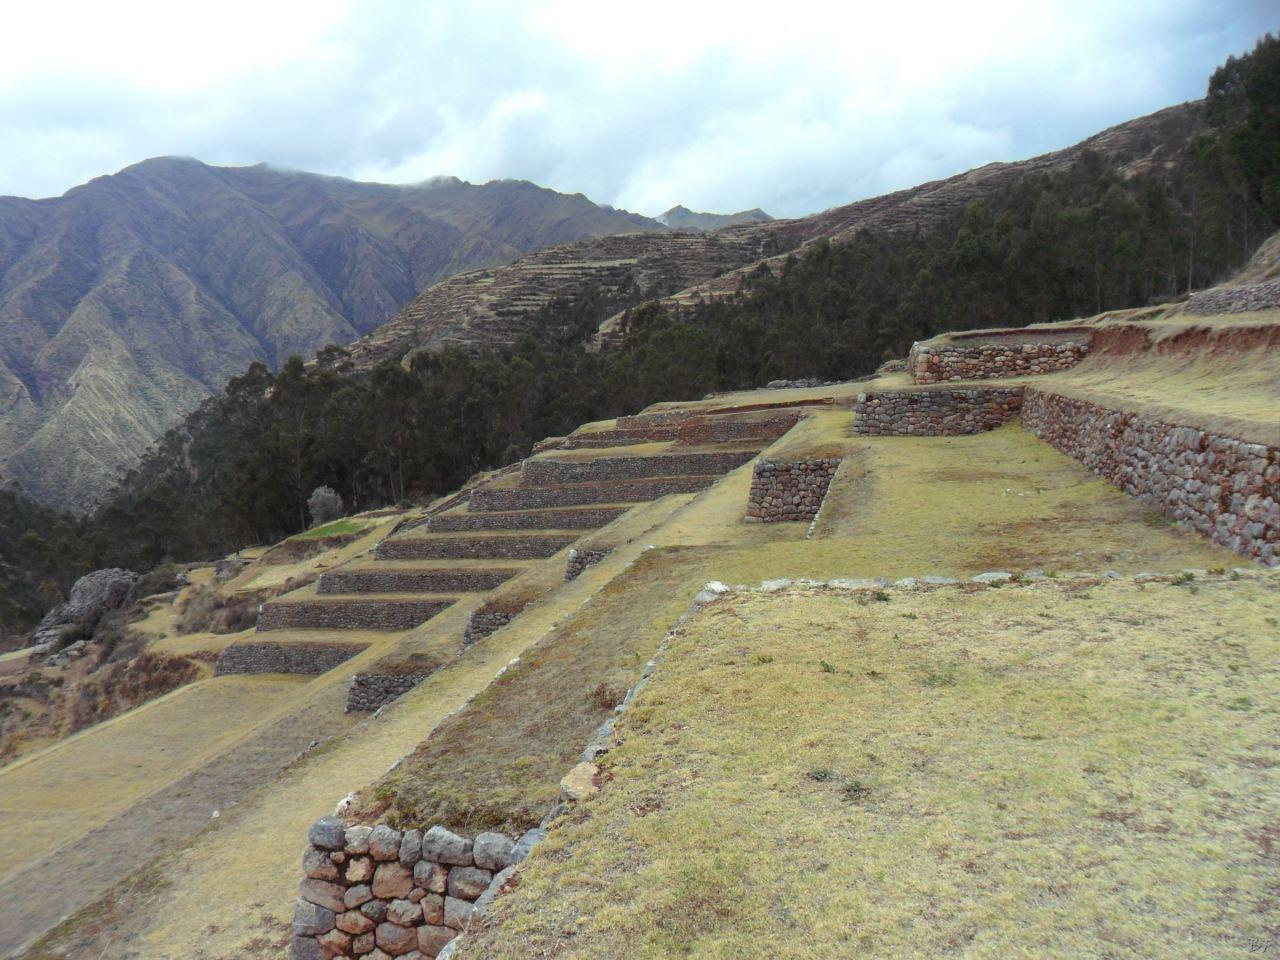 Chinchero-Mura-Poligonali-Piramide-Urubamba-Peru-55